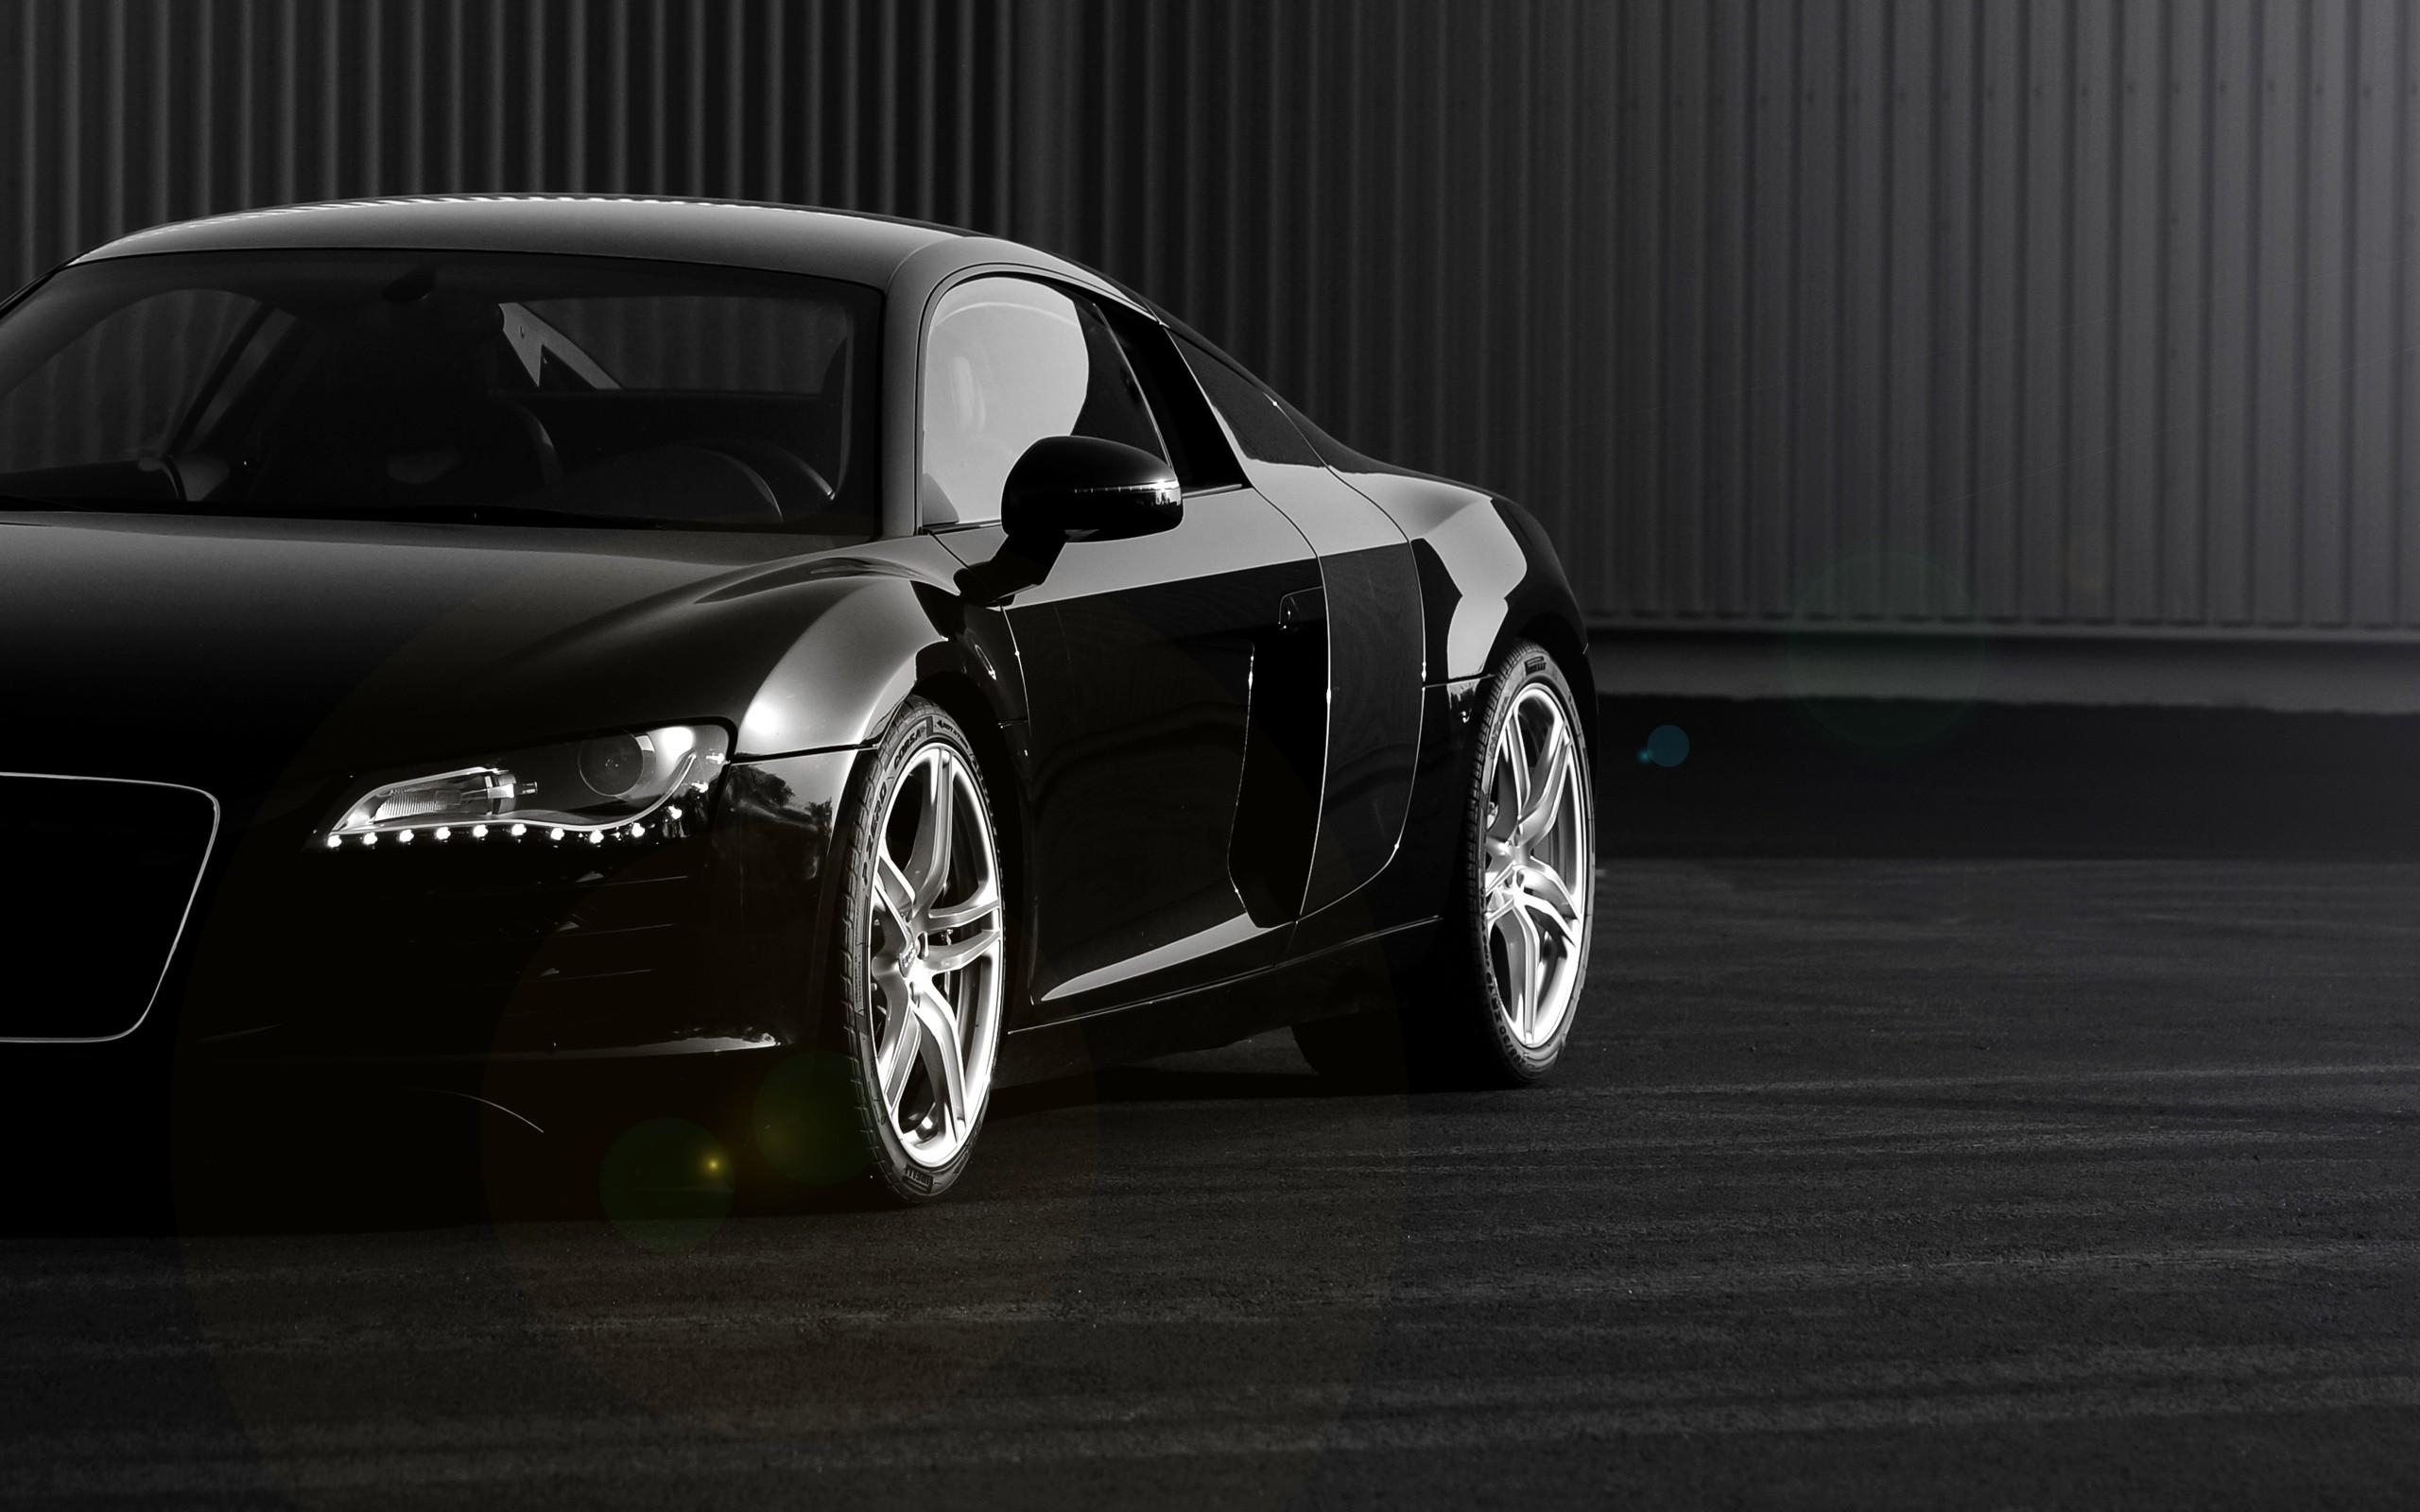 Audi R8 Hd Wallpaper 78 Pictures Images, Photos, Reviews